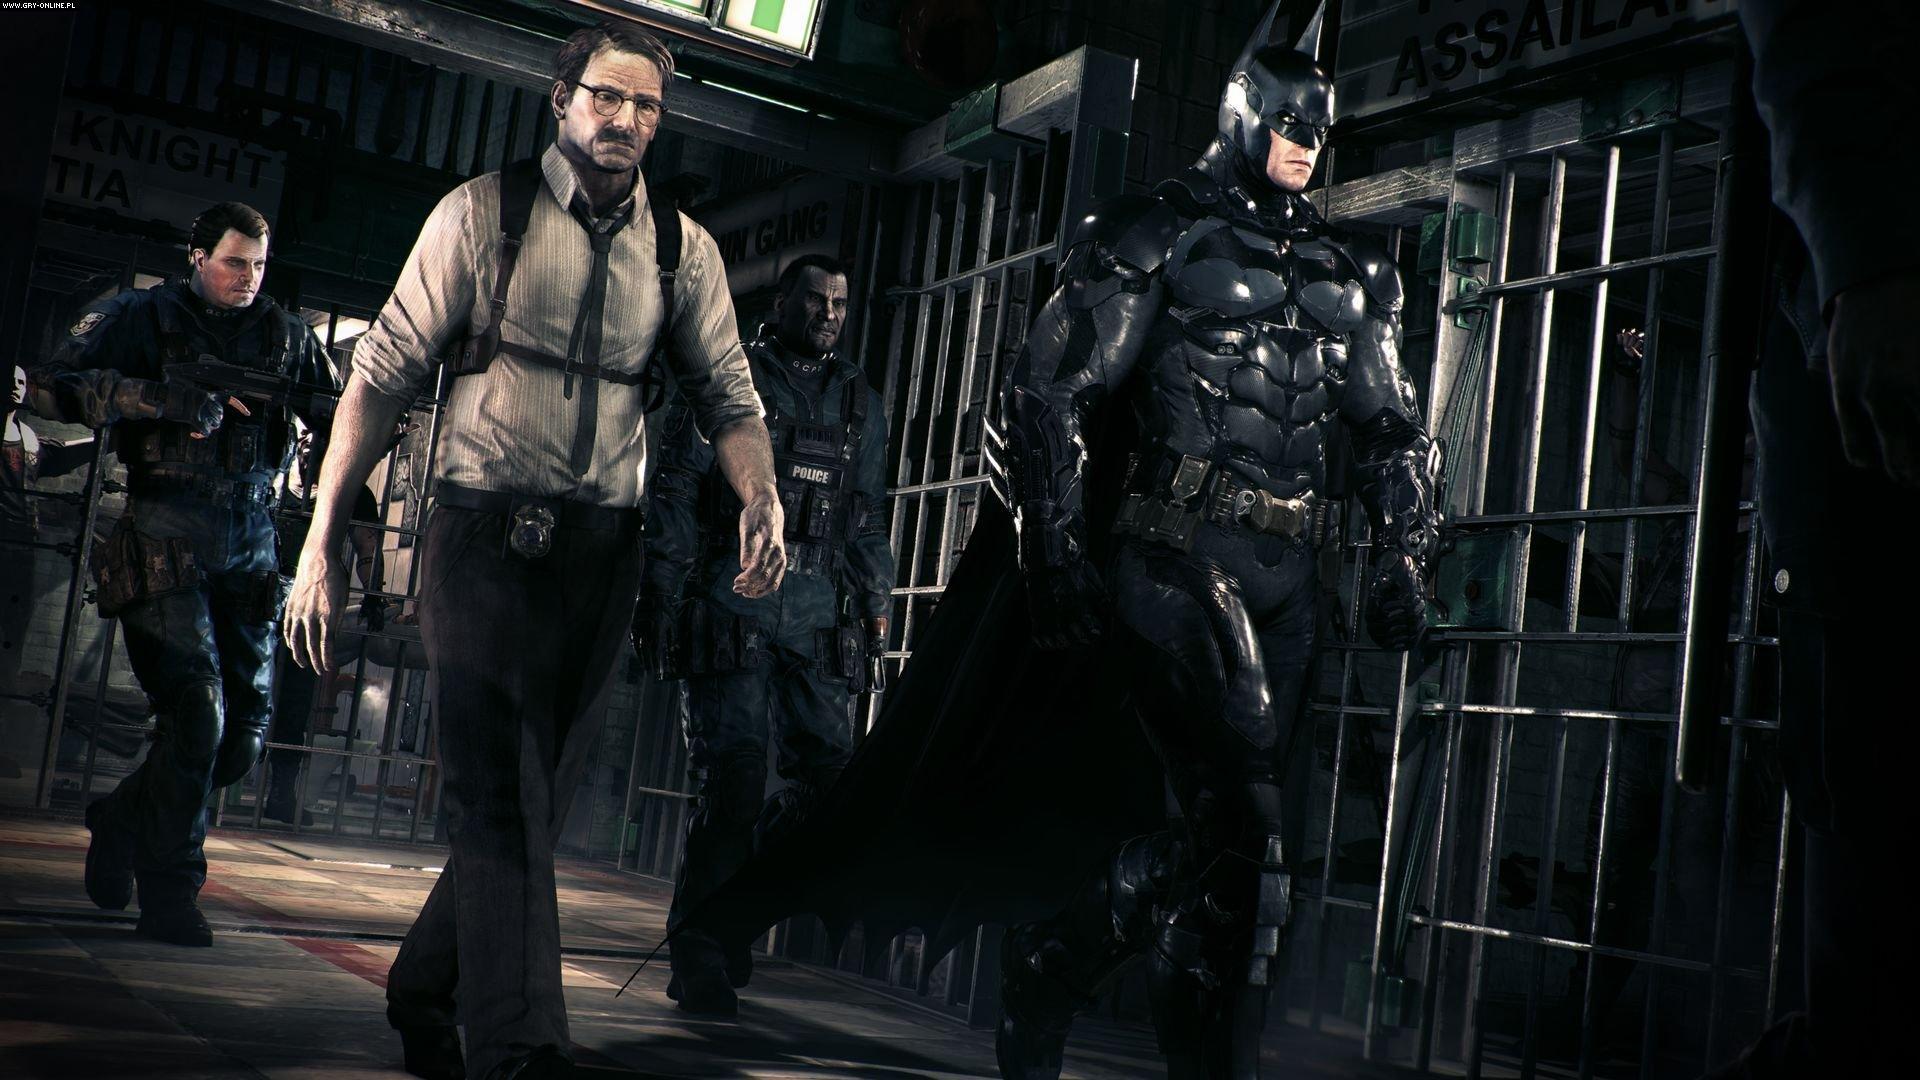 Batman Arkham Knight image #8